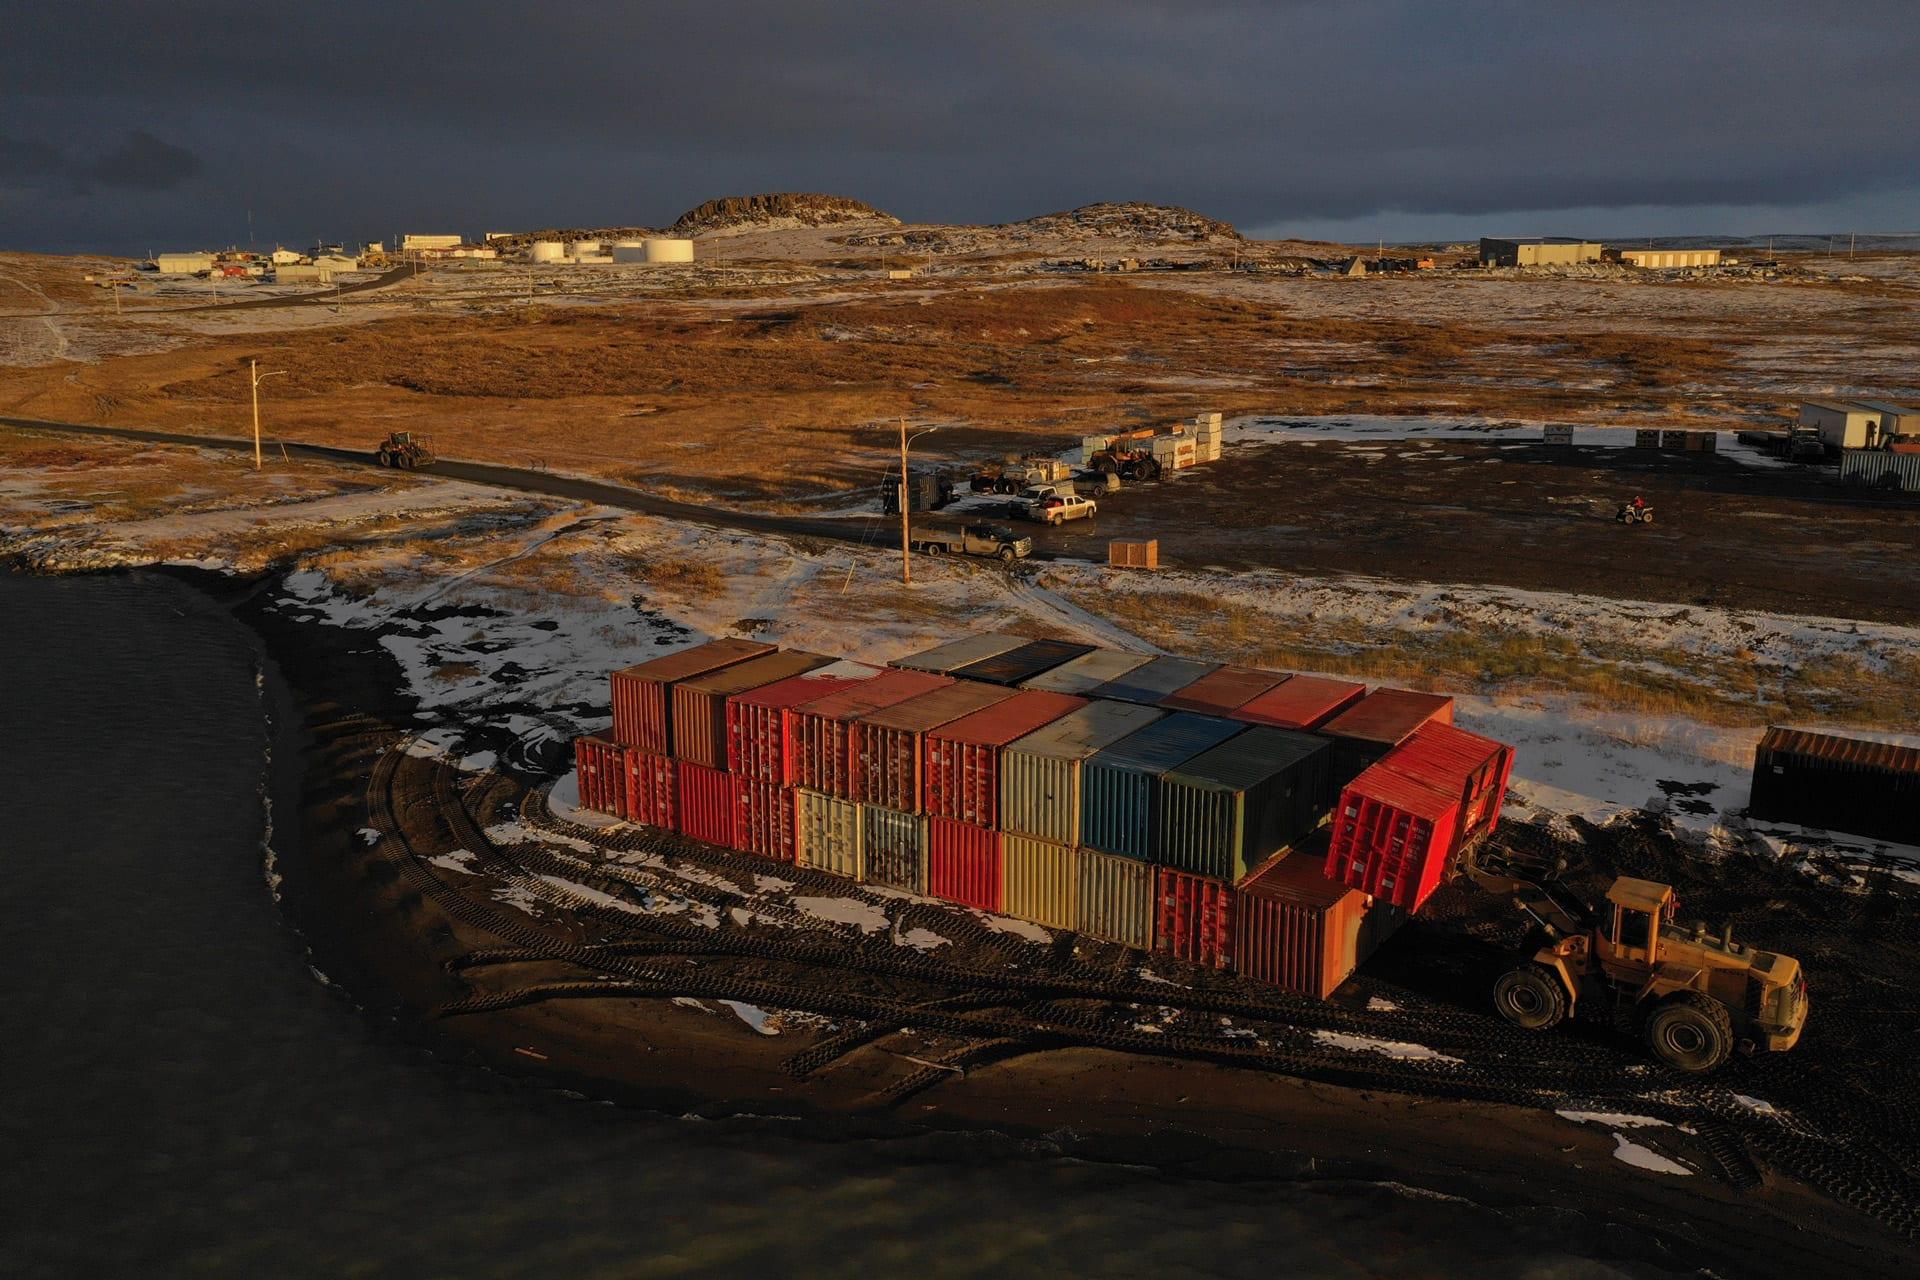 Cargo loader piling up seacans in Kugluktuk